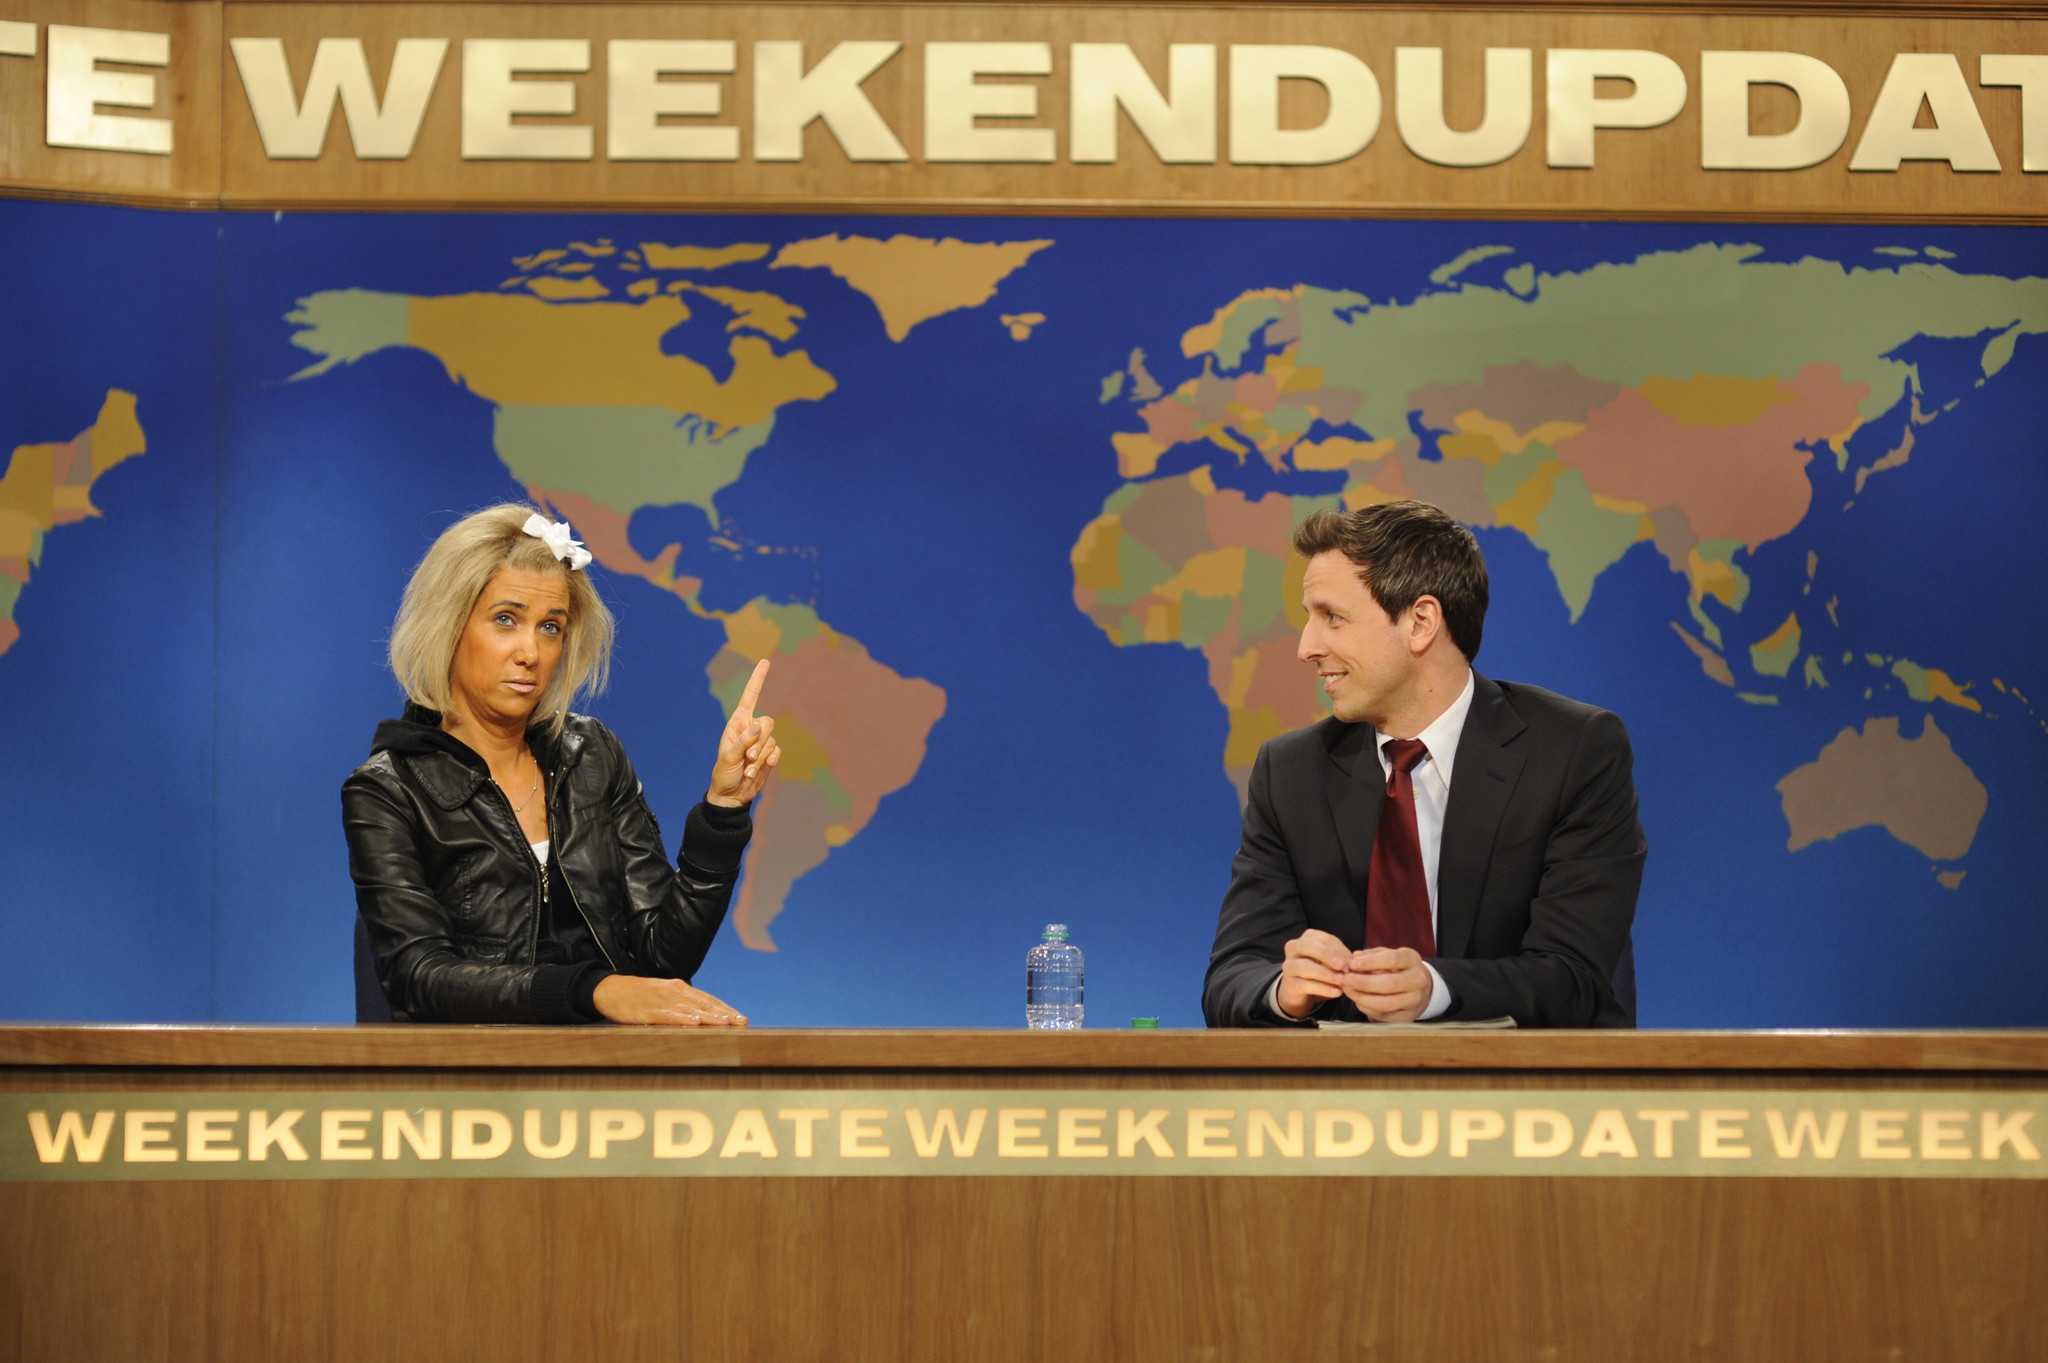 NBC-Universal settles Saturday Night Live intern lawsuit